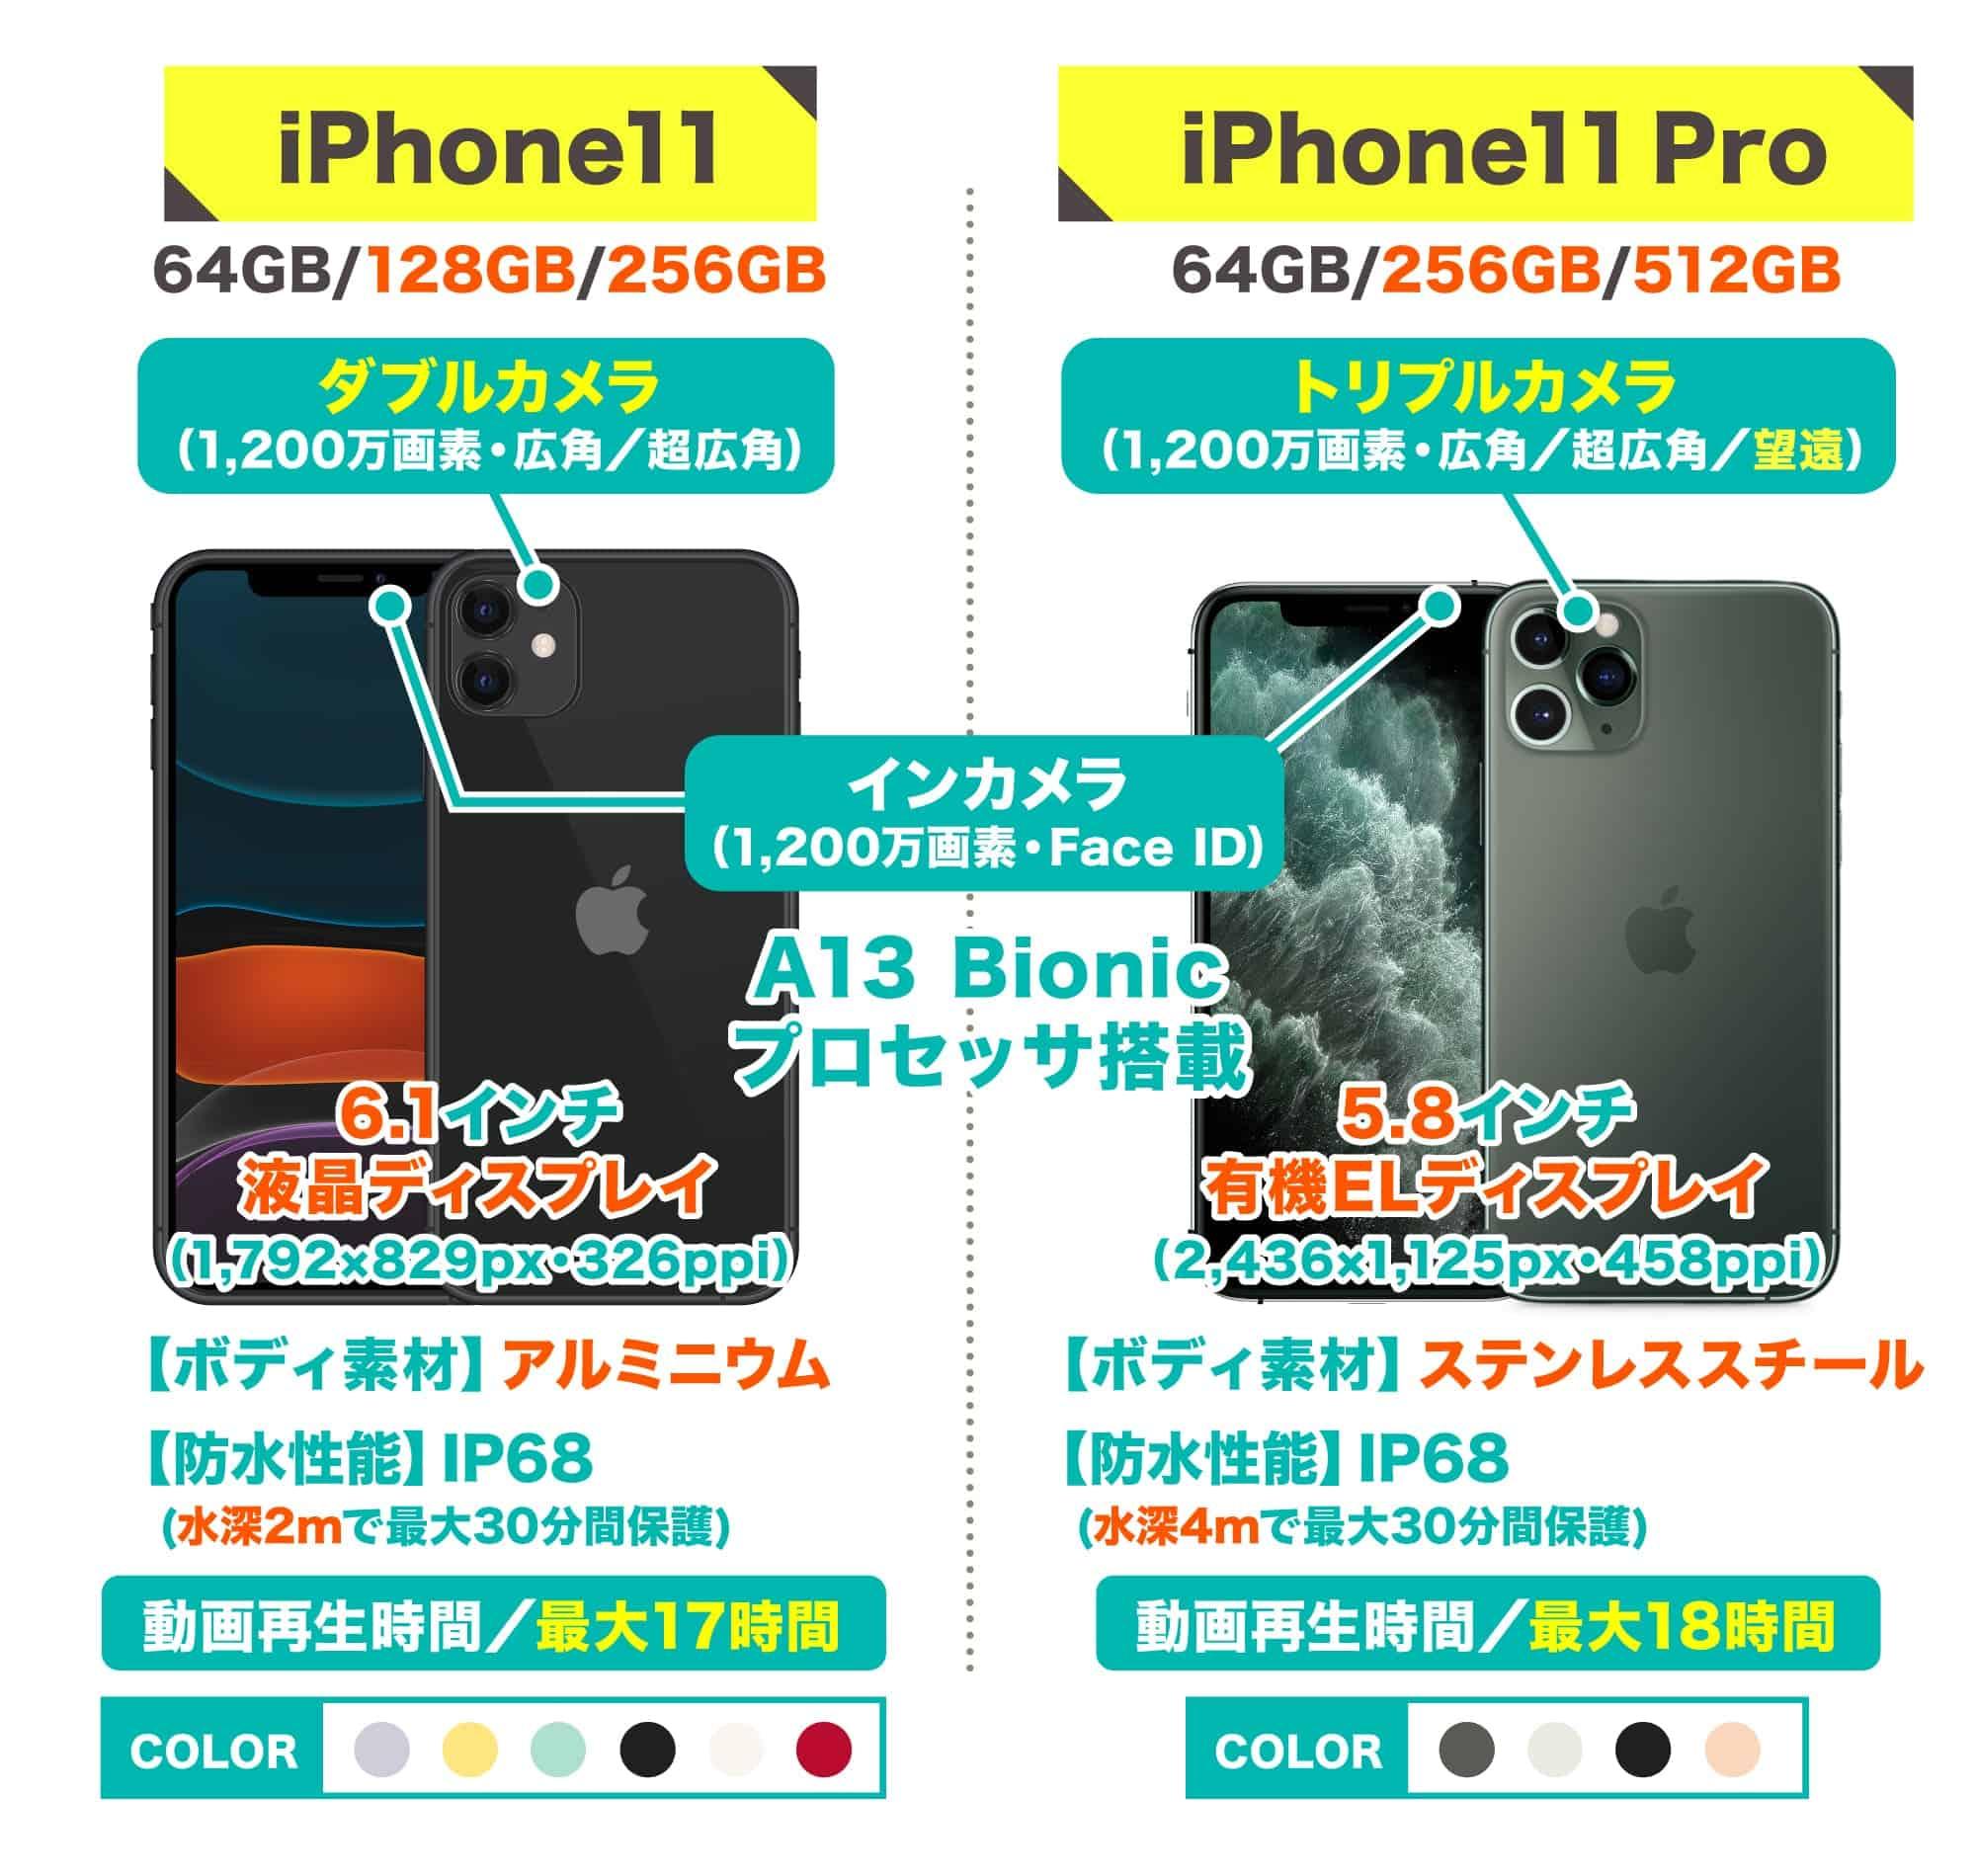 Apple-iPhone-11-Pro++-min